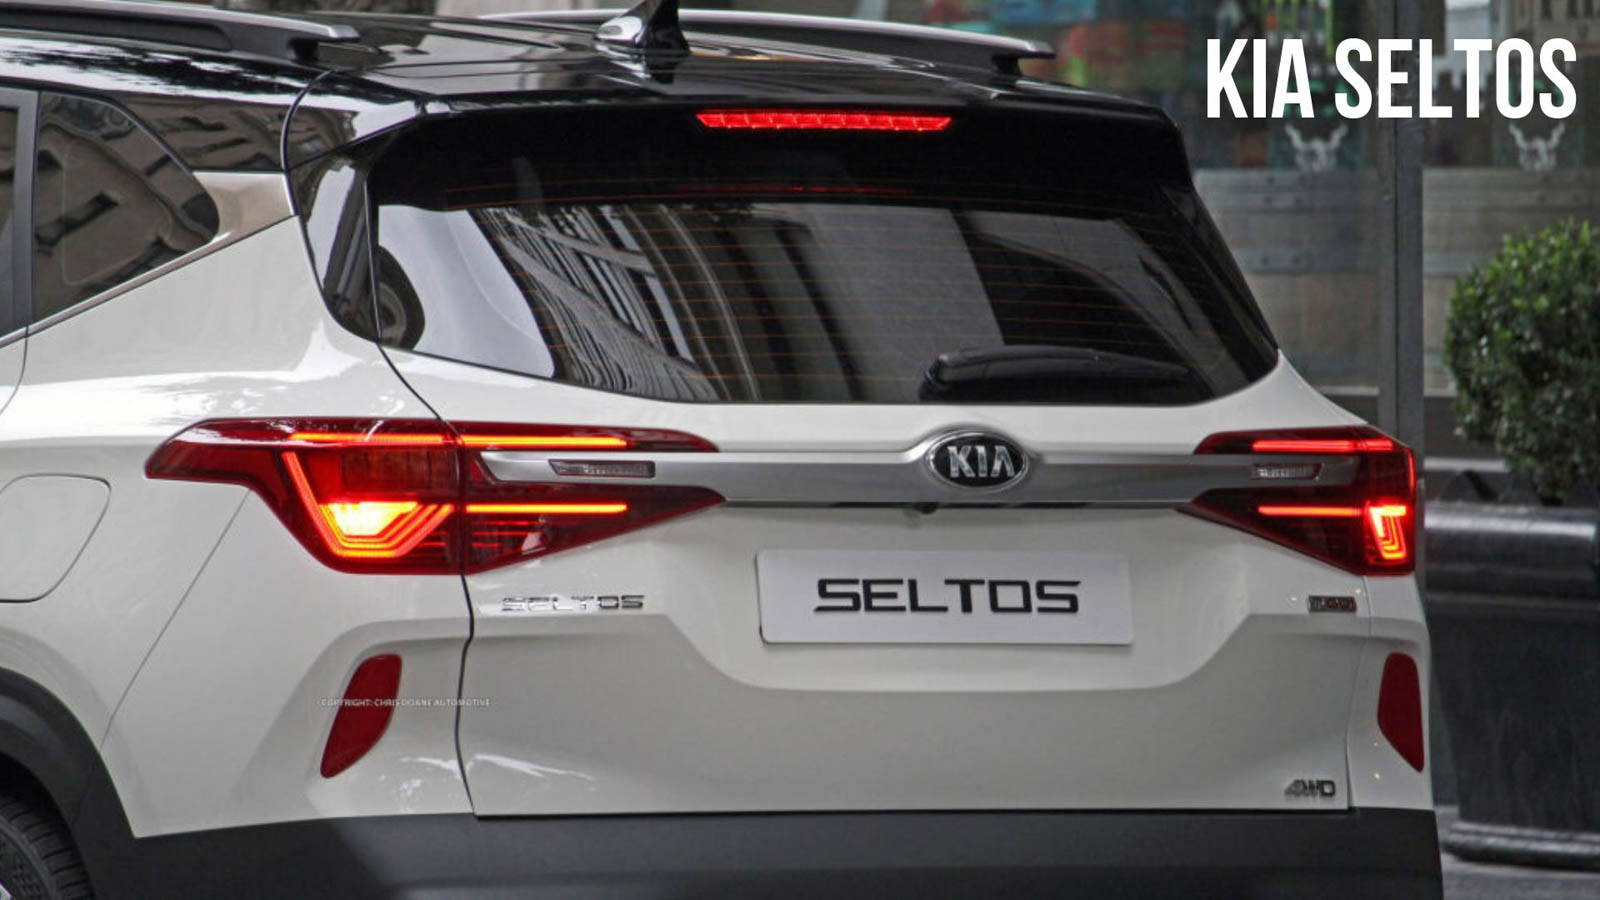 Kia SP2i officially confirmed to be named Kia Seltos